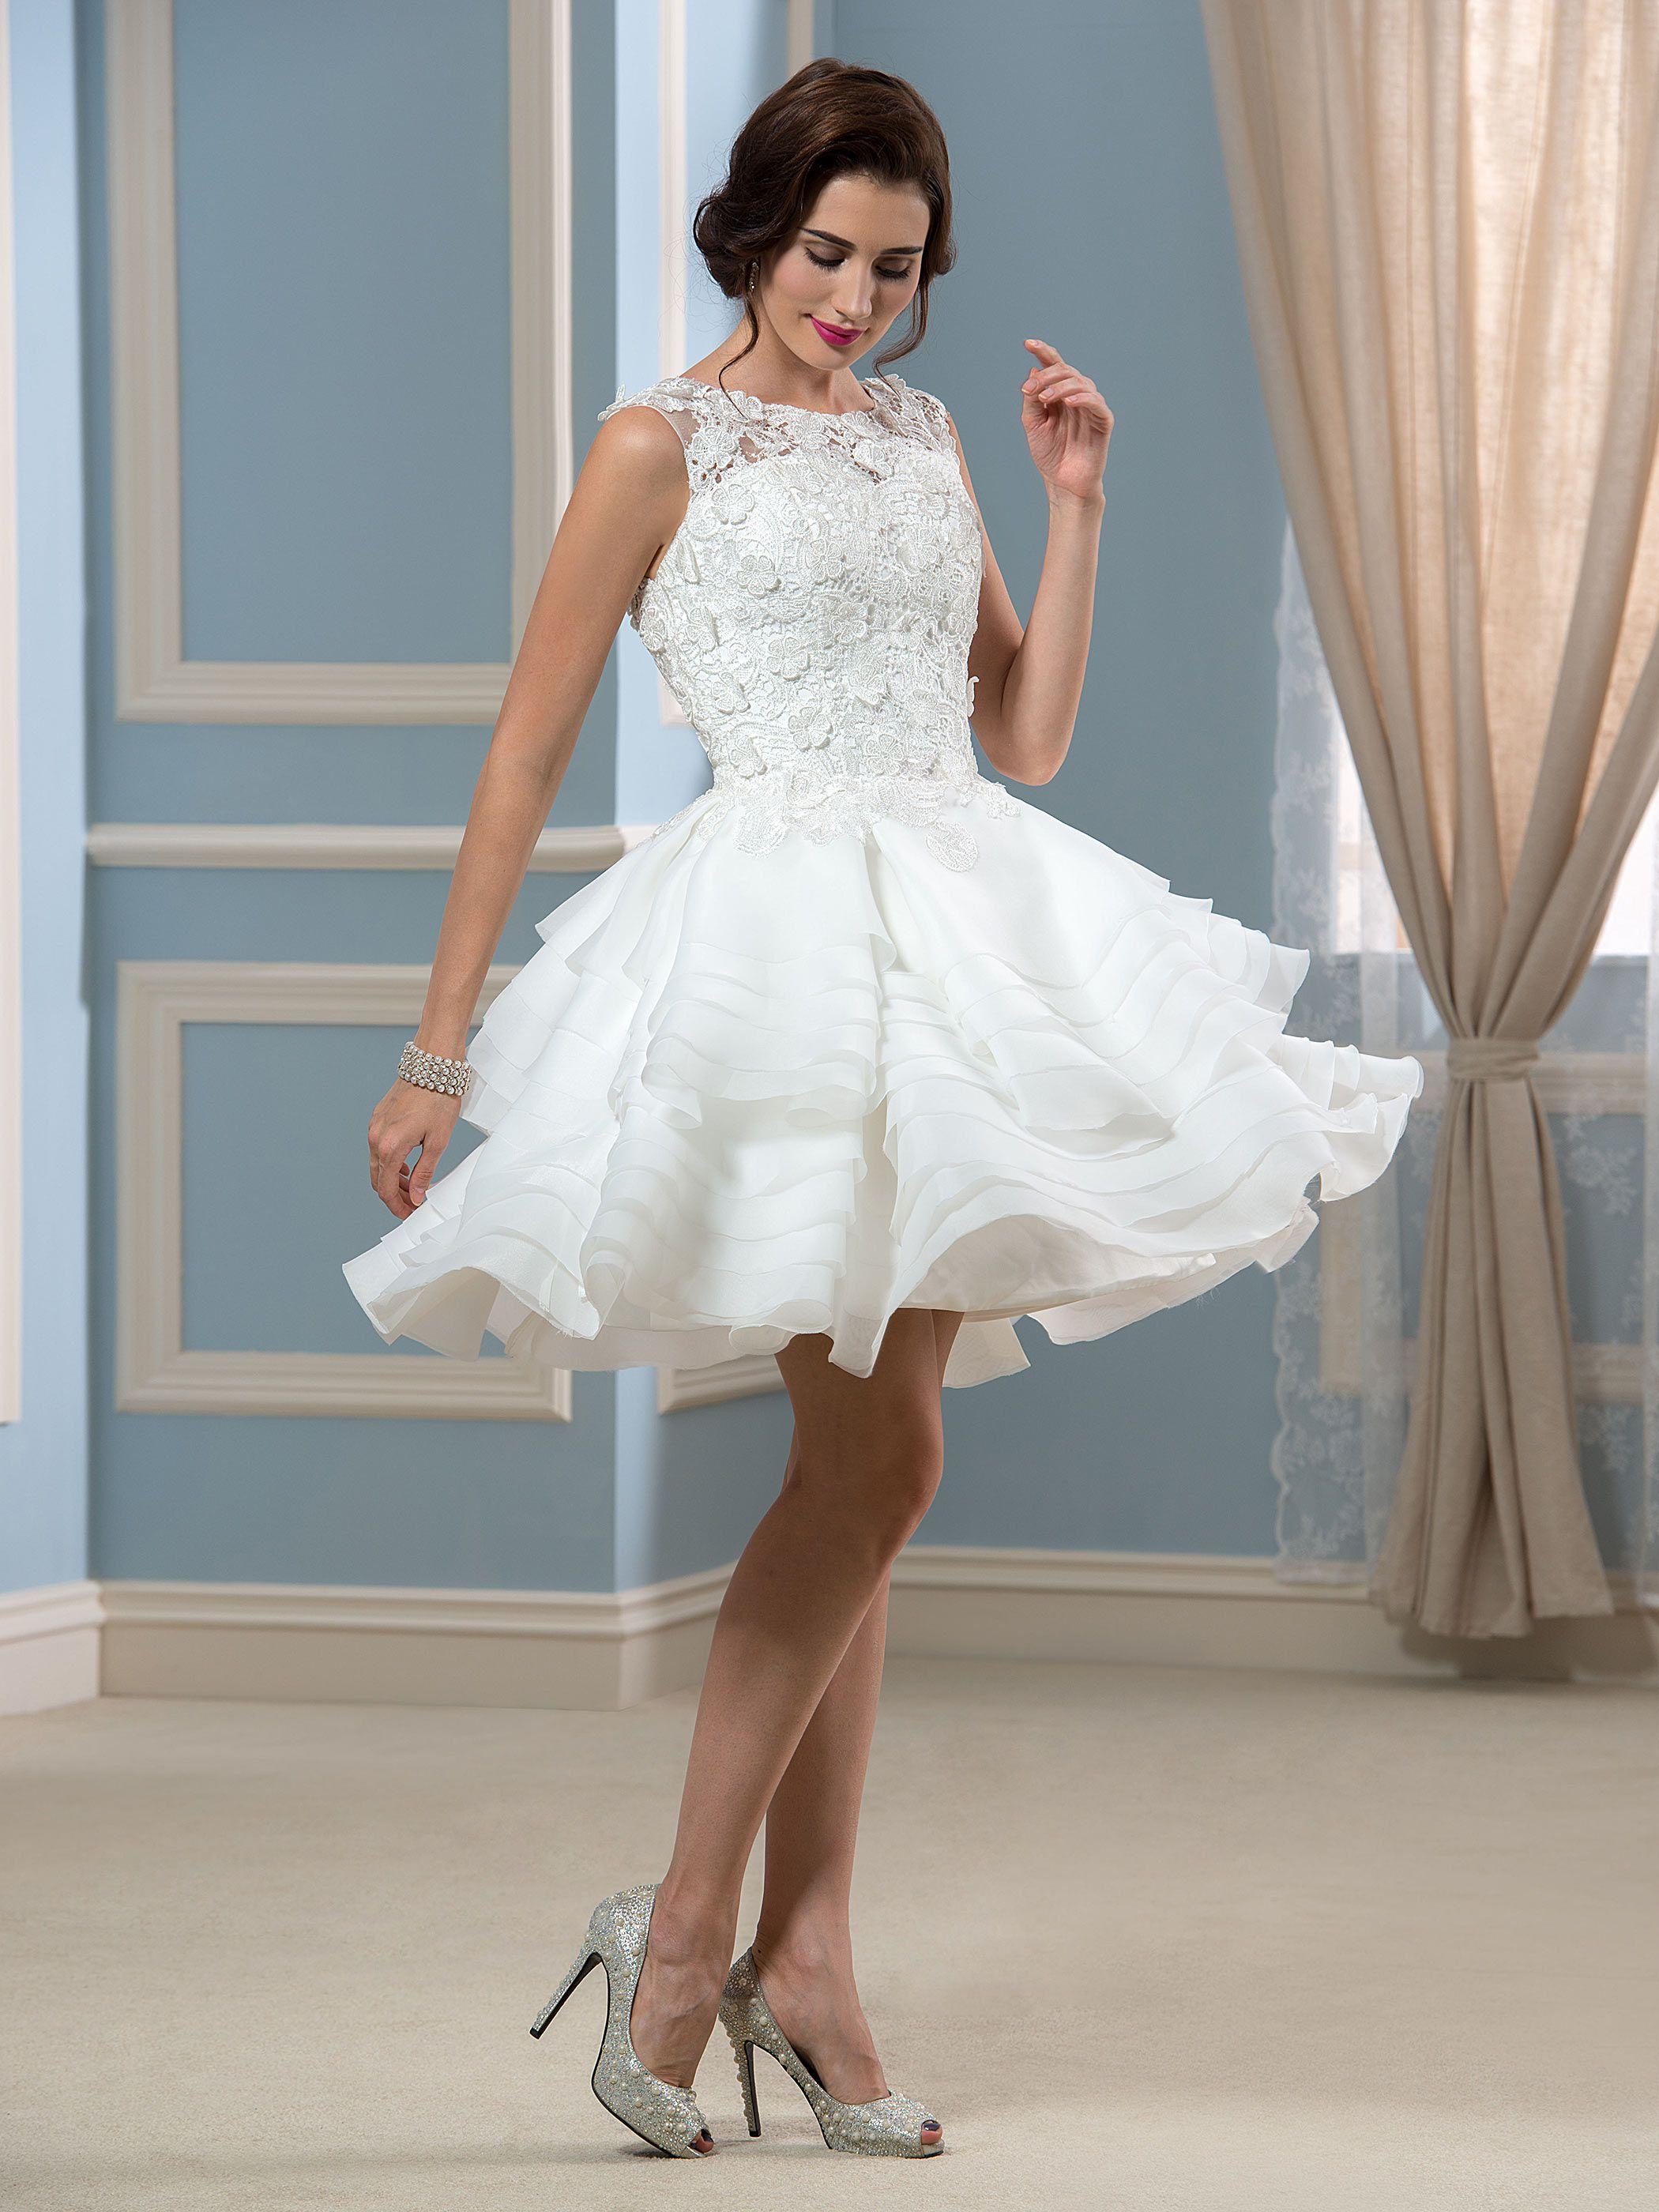 Appliques lace short beach wedding dress married in tbdress